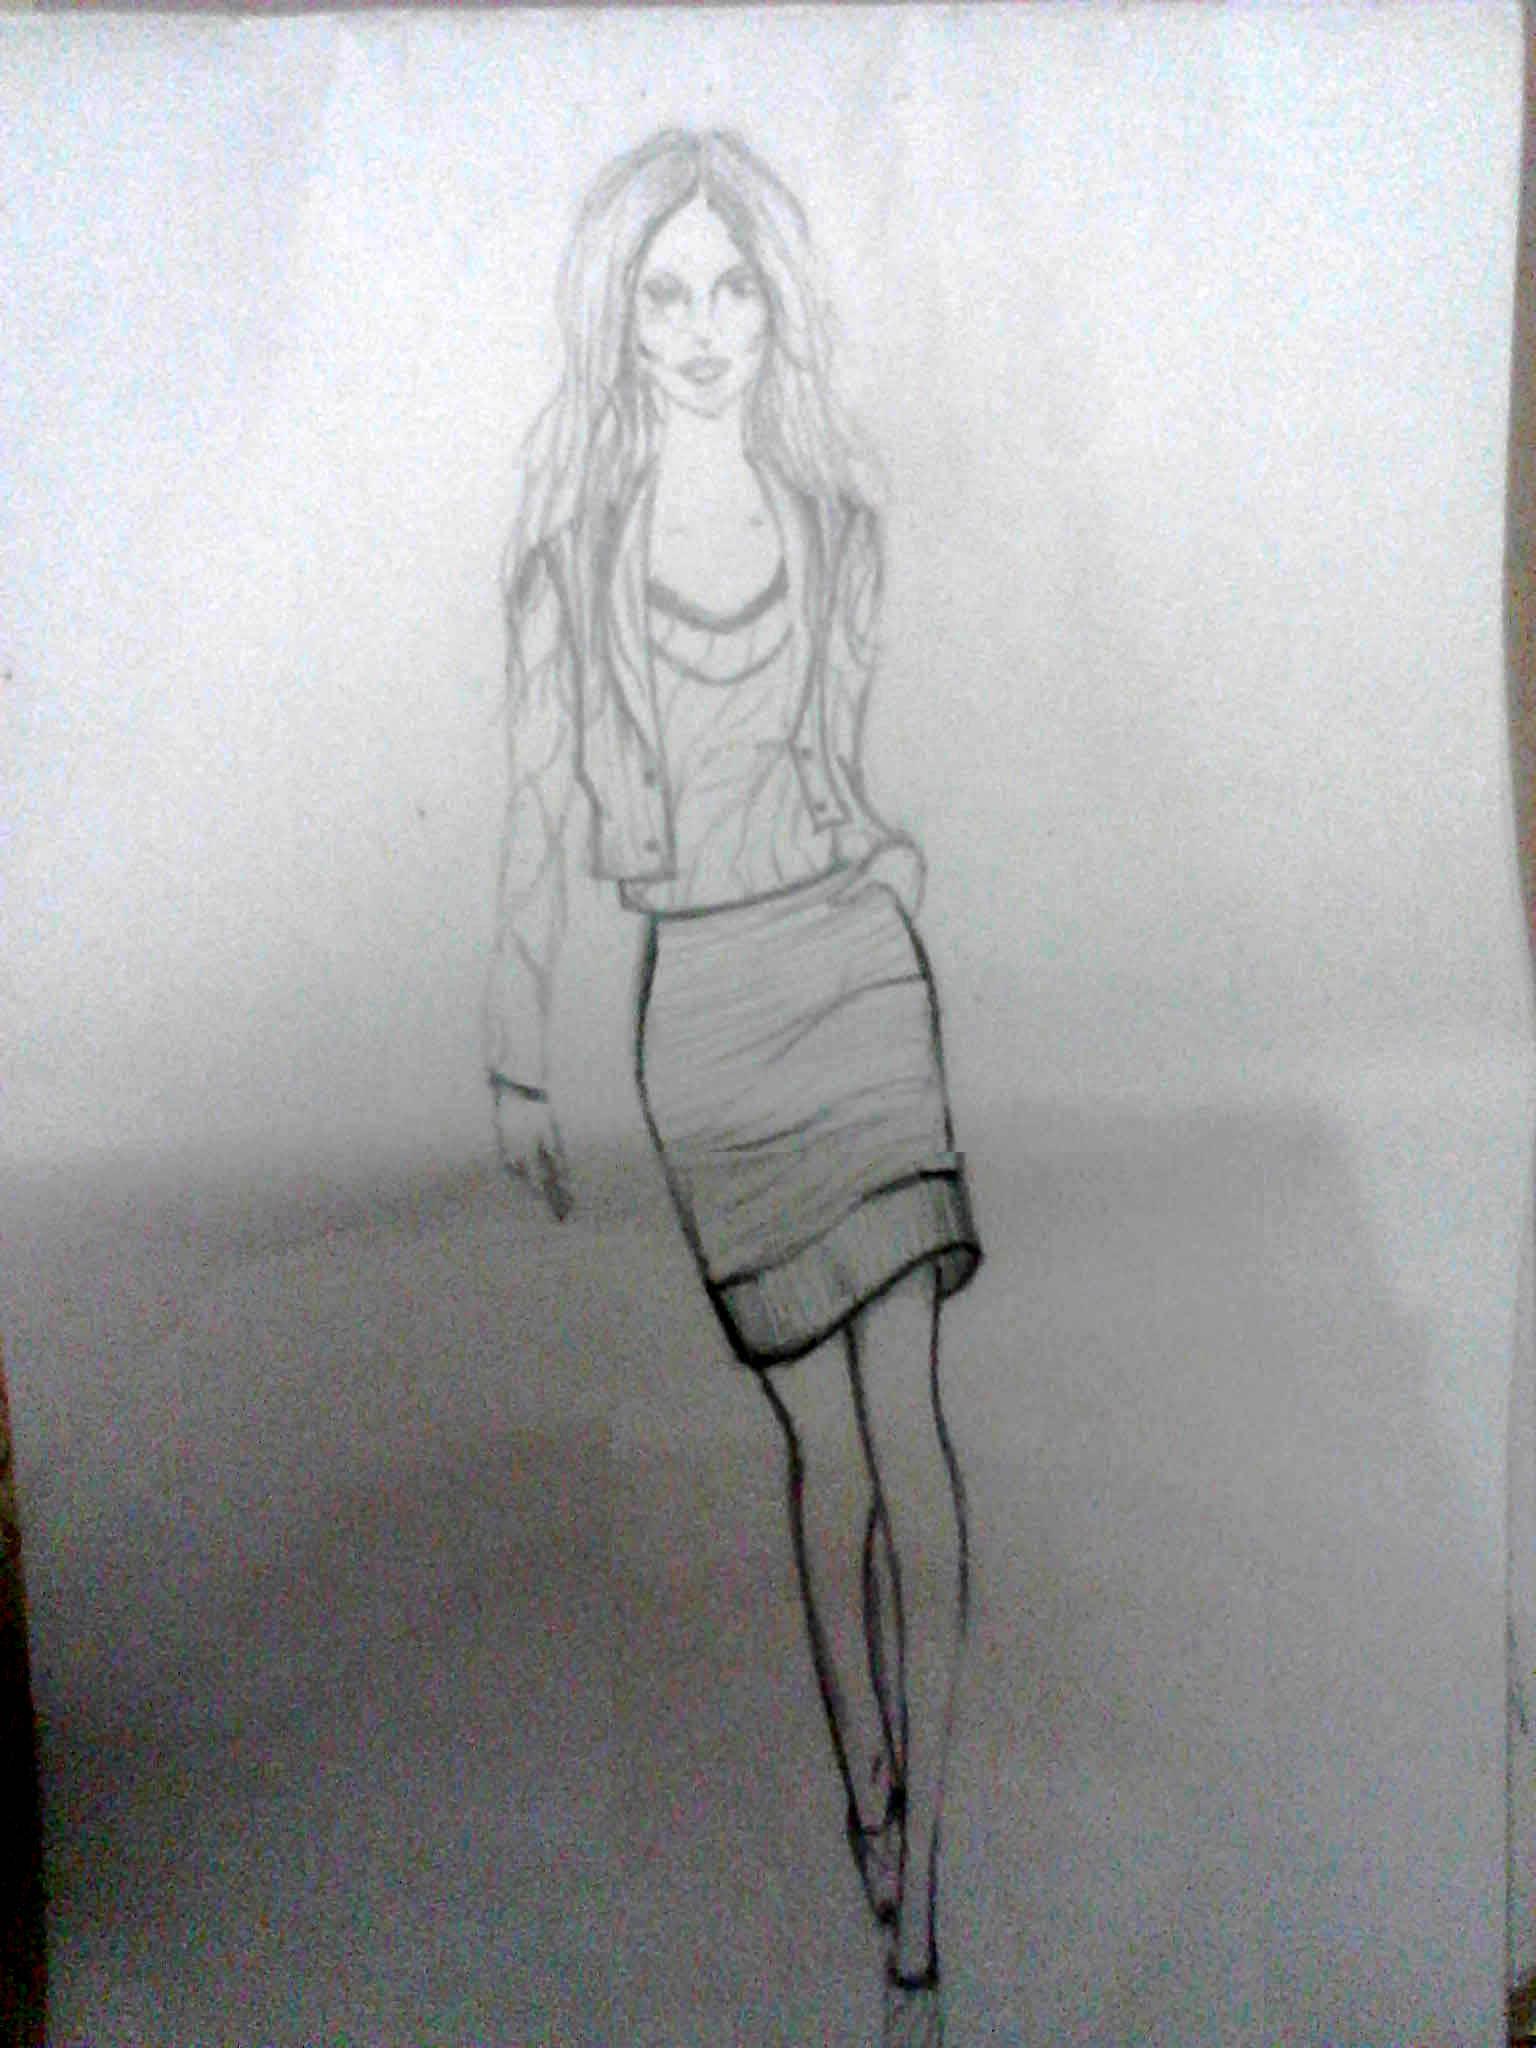 d7171f628 تصميم ازياء. رسم بالقلم الرصاص